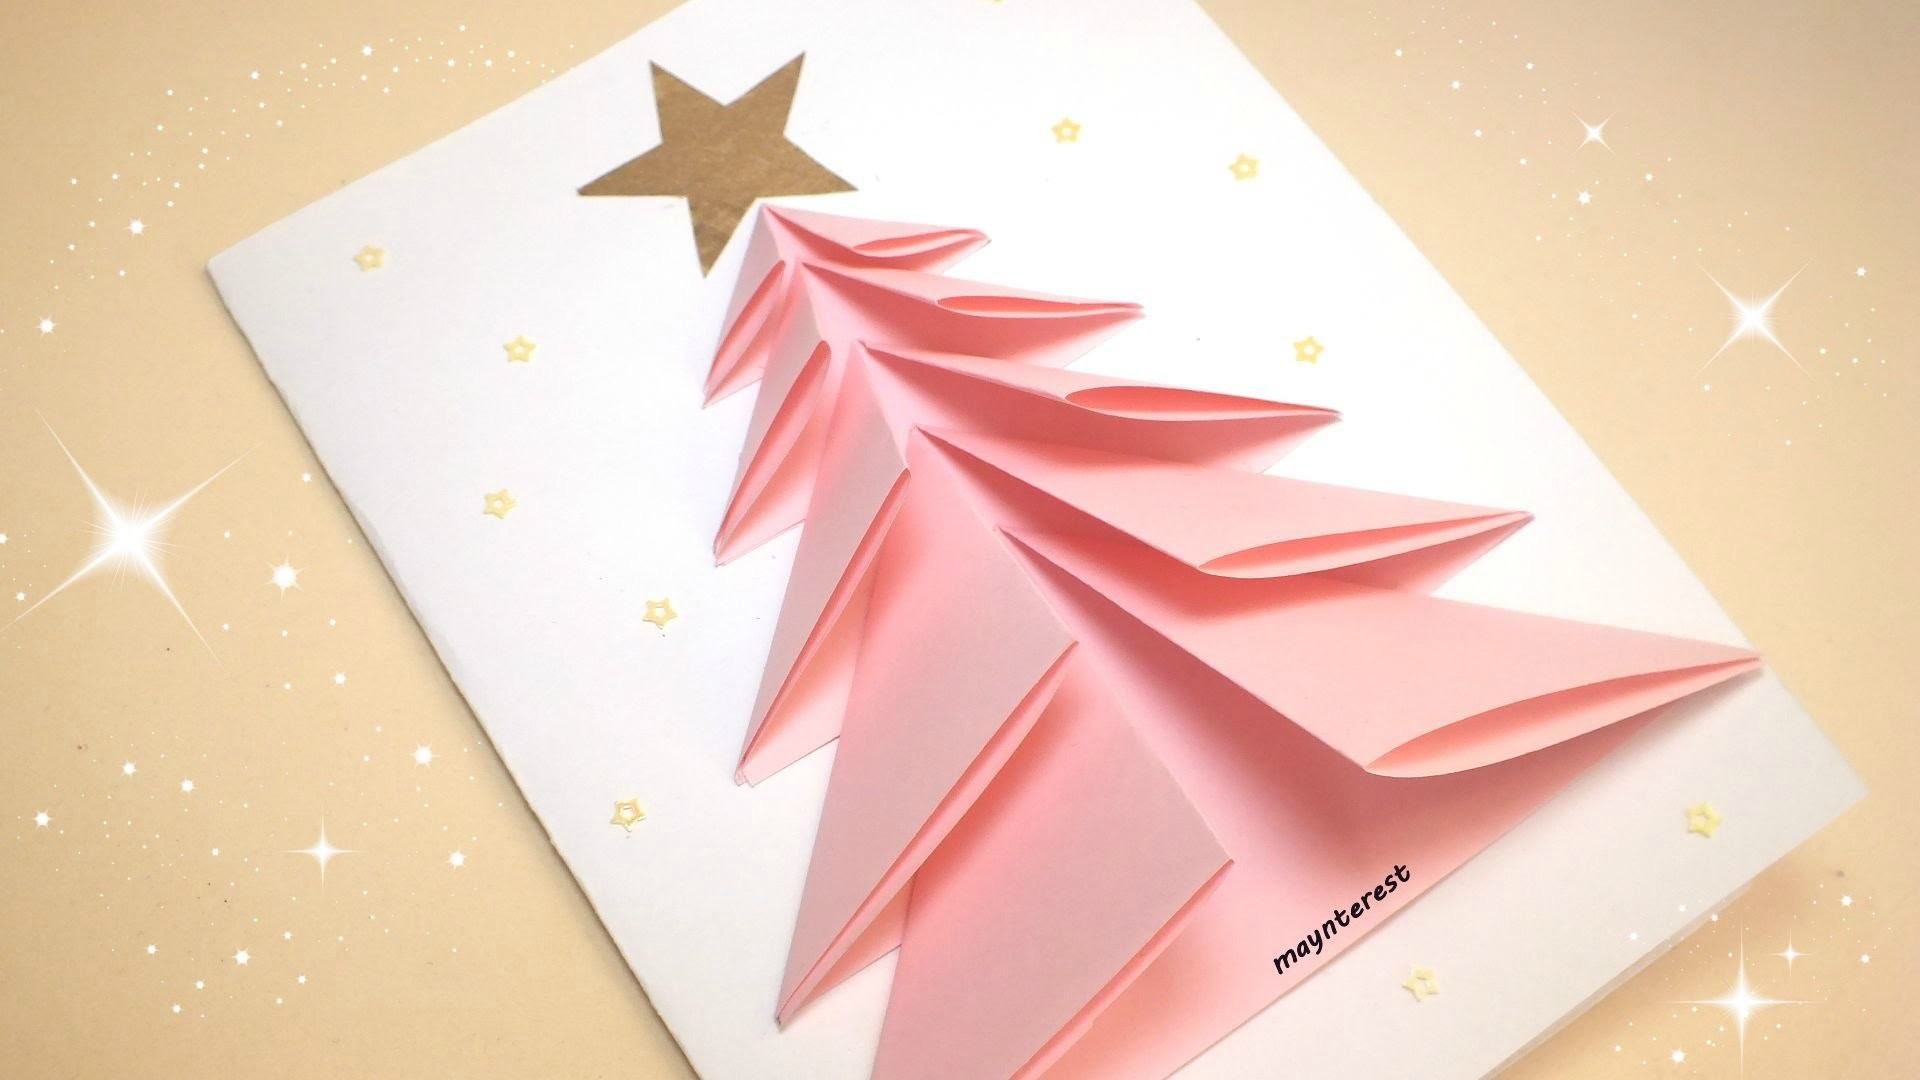 Manualidades navidad tarjeta de felicitaci n navide a - Hacer una tarjeta navidena ...